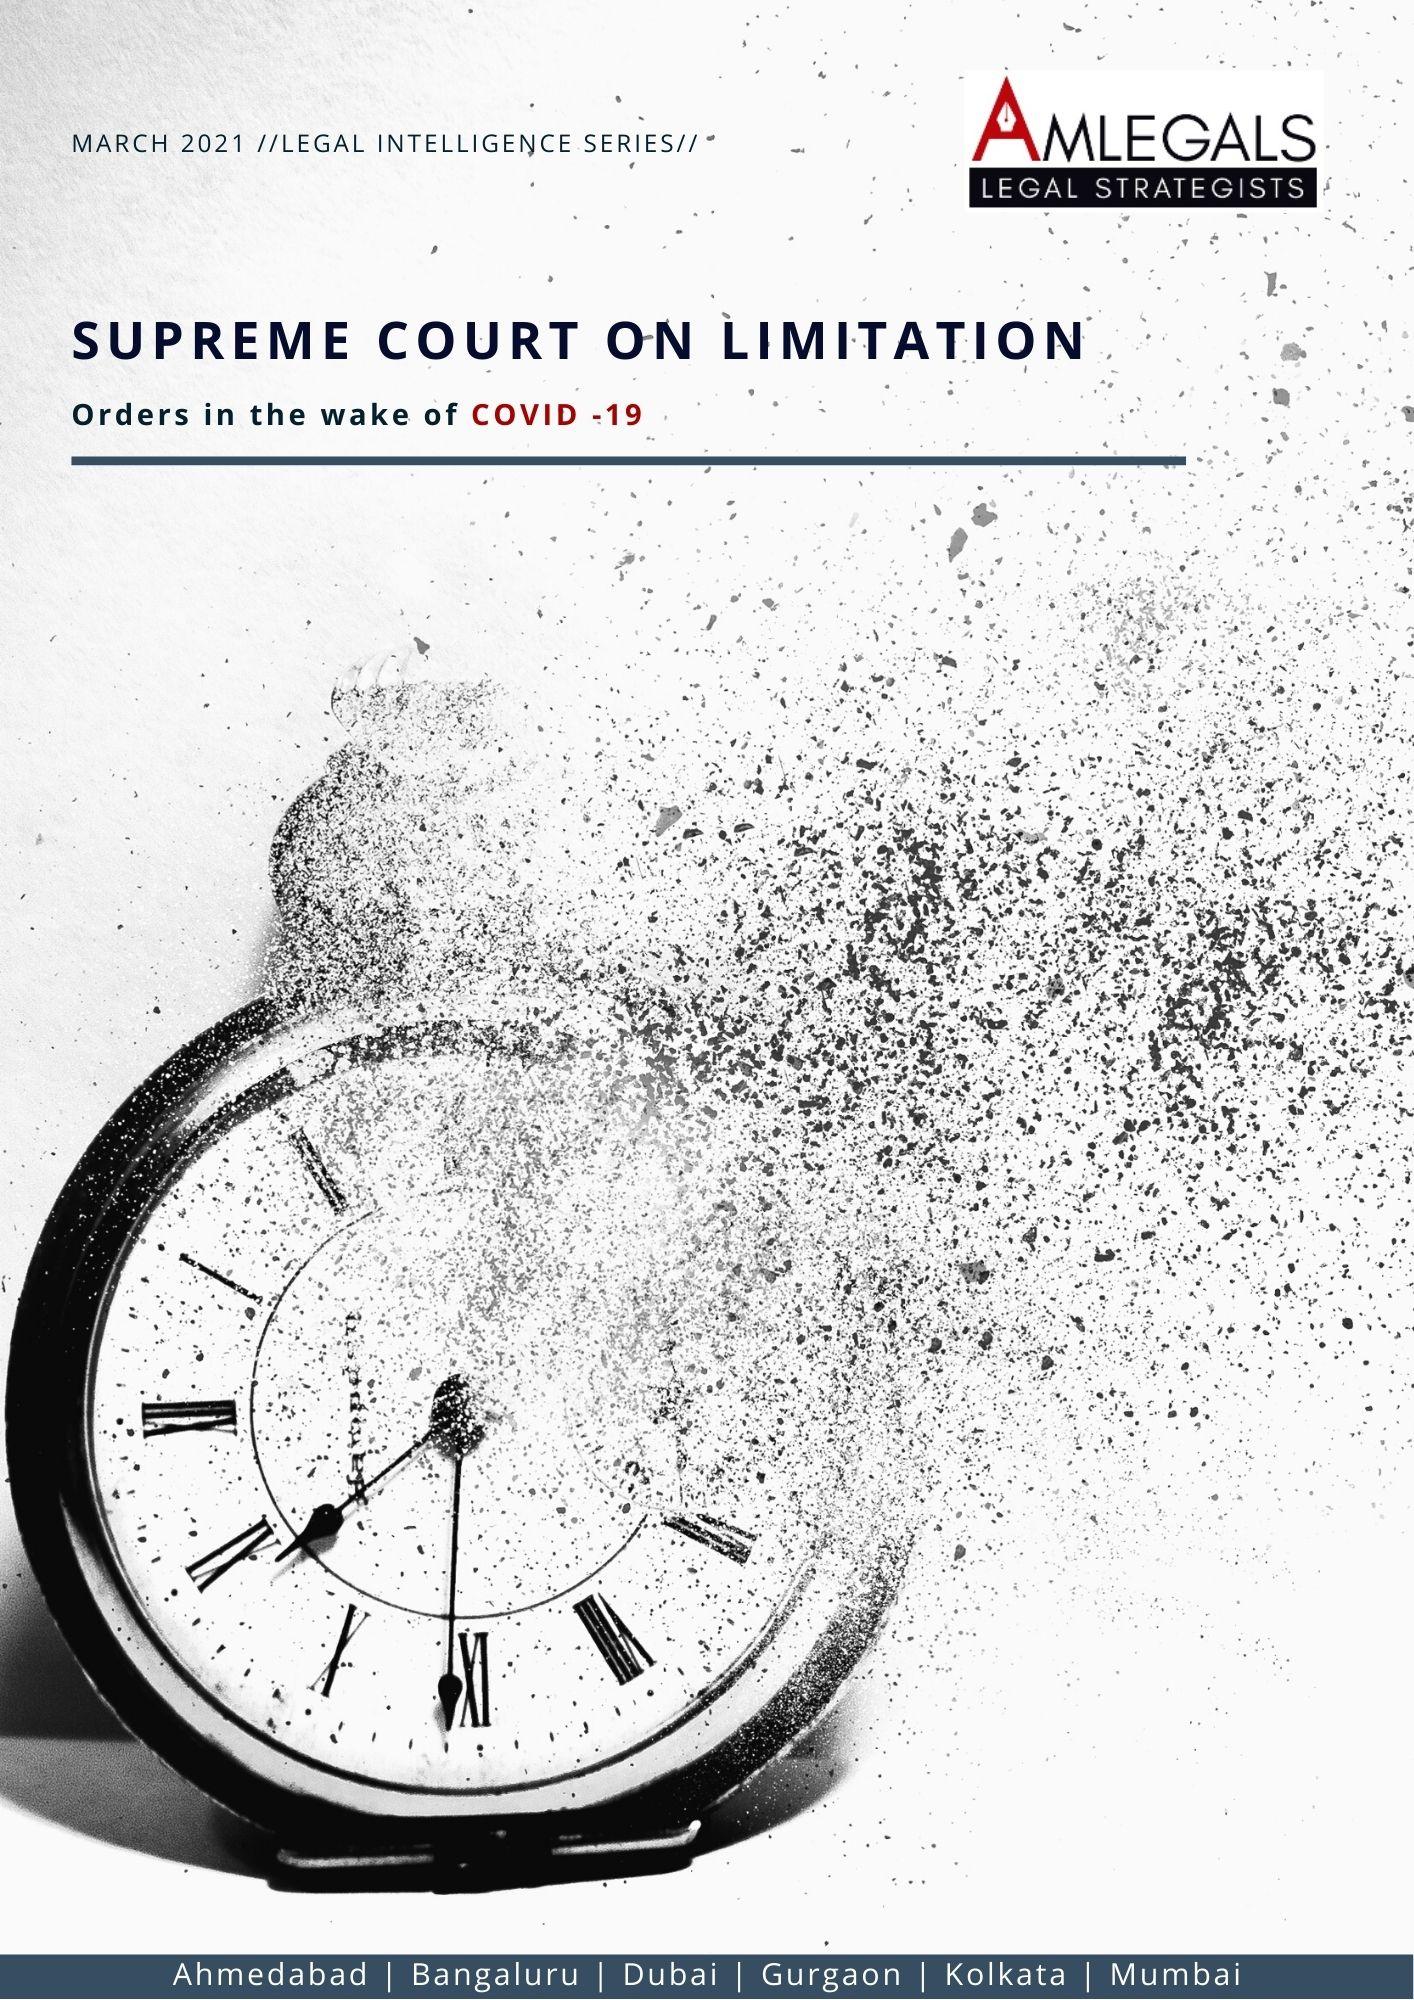 Supreme Court on Limitation